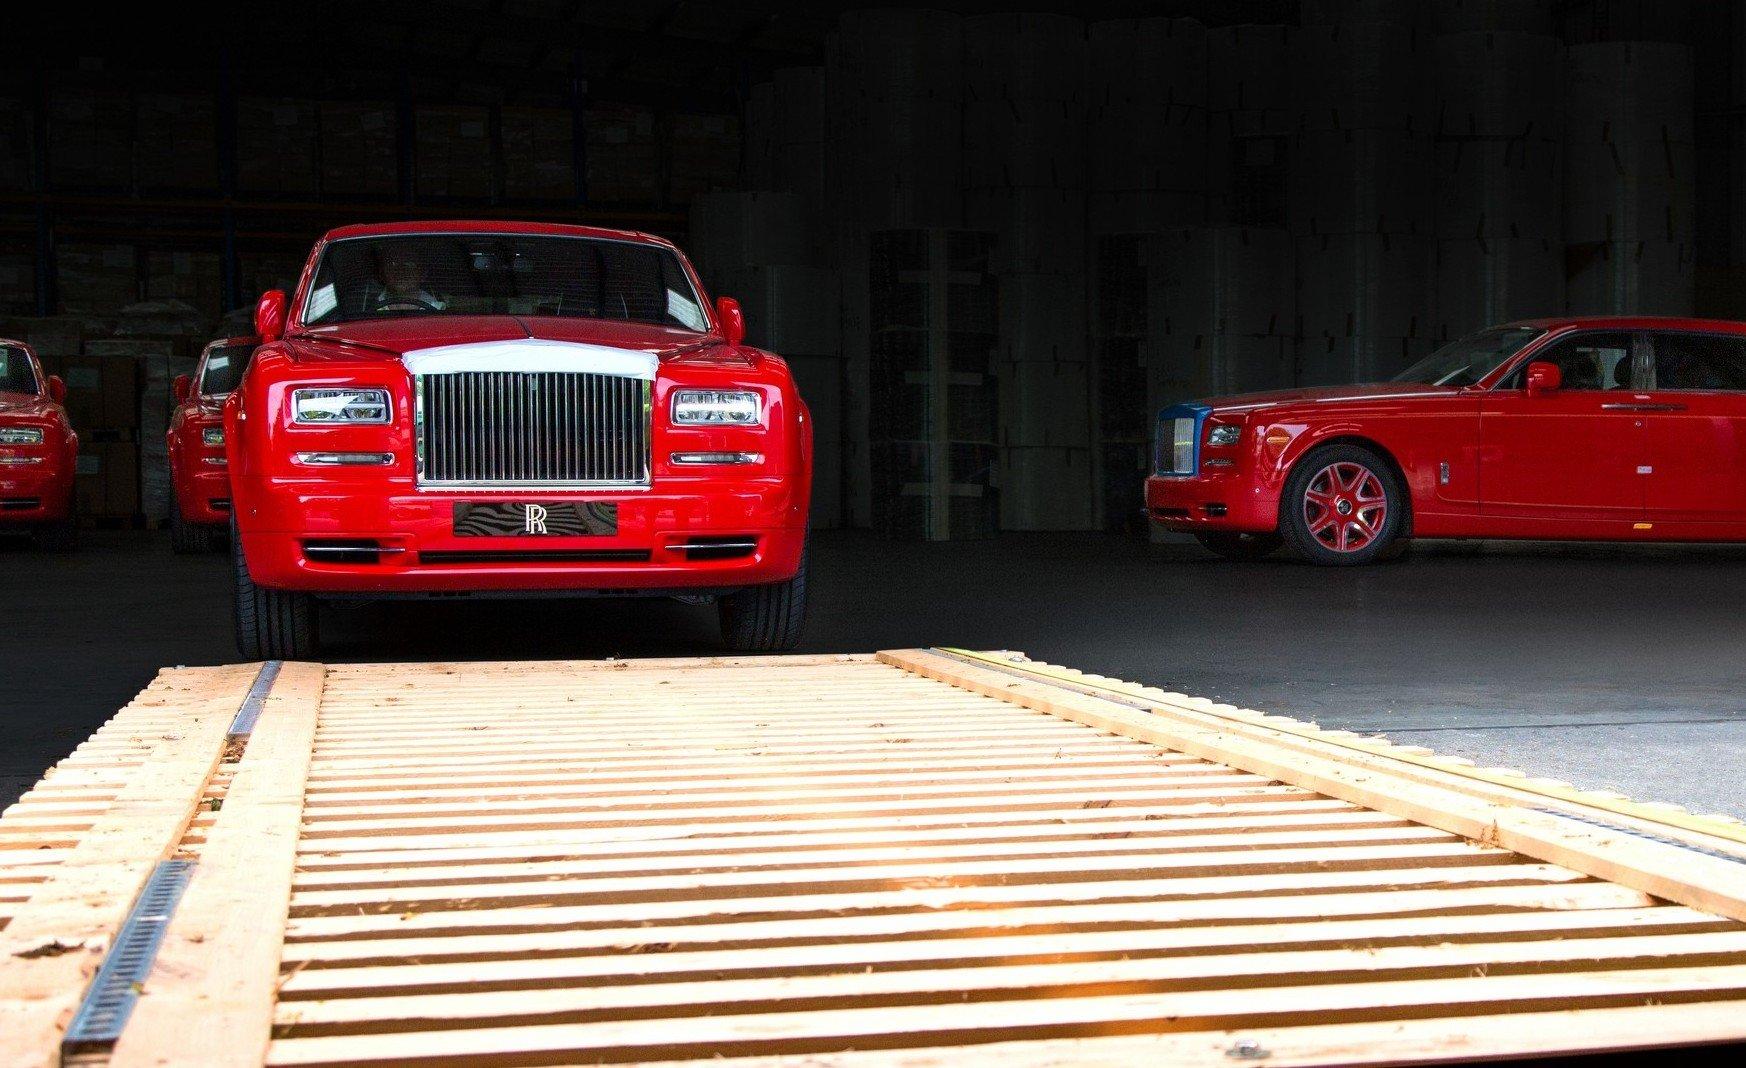 Entrepreneur Stephen Hung finally receives custom made fleet of 30 Rolls-Royce Phantoms -